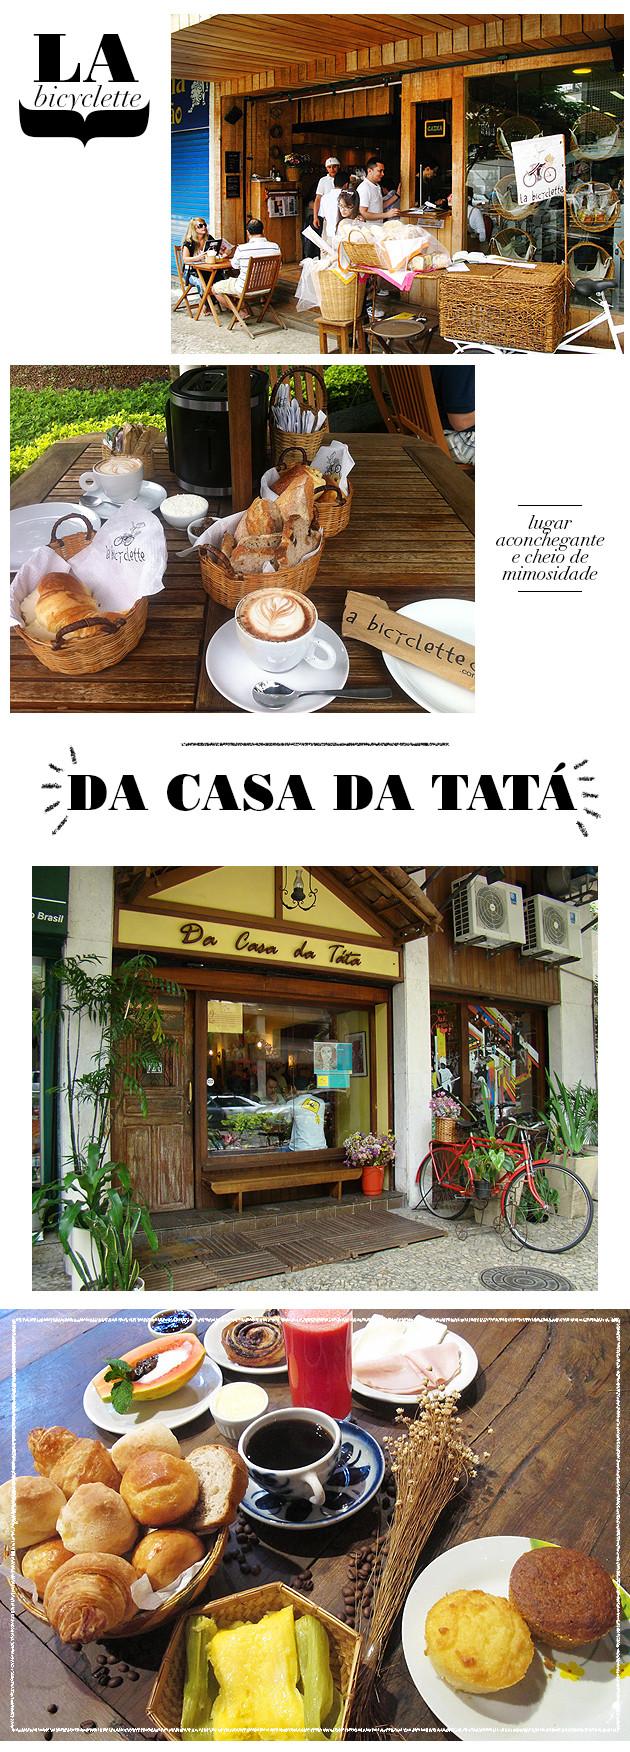 LD_ONDE_TOMAR_CAFÉ_RJ_2